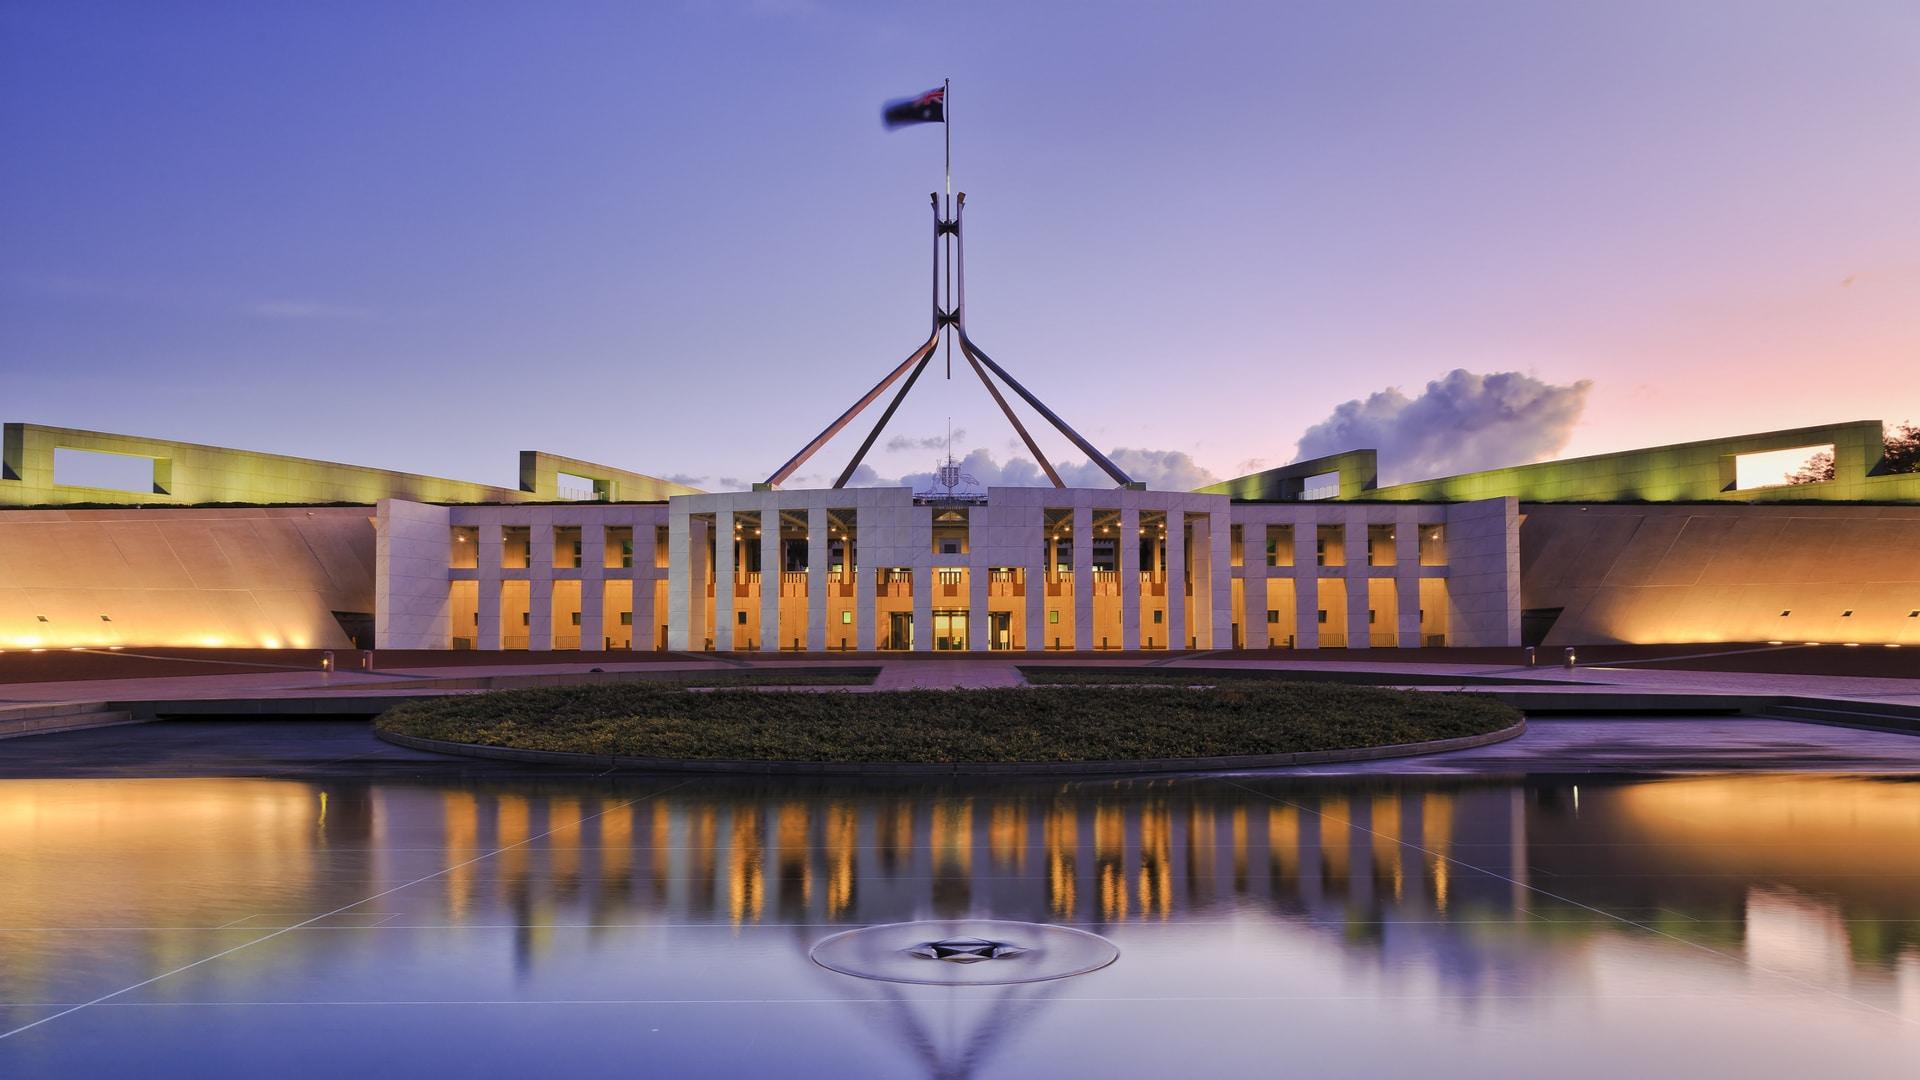 Australia House of Parliament